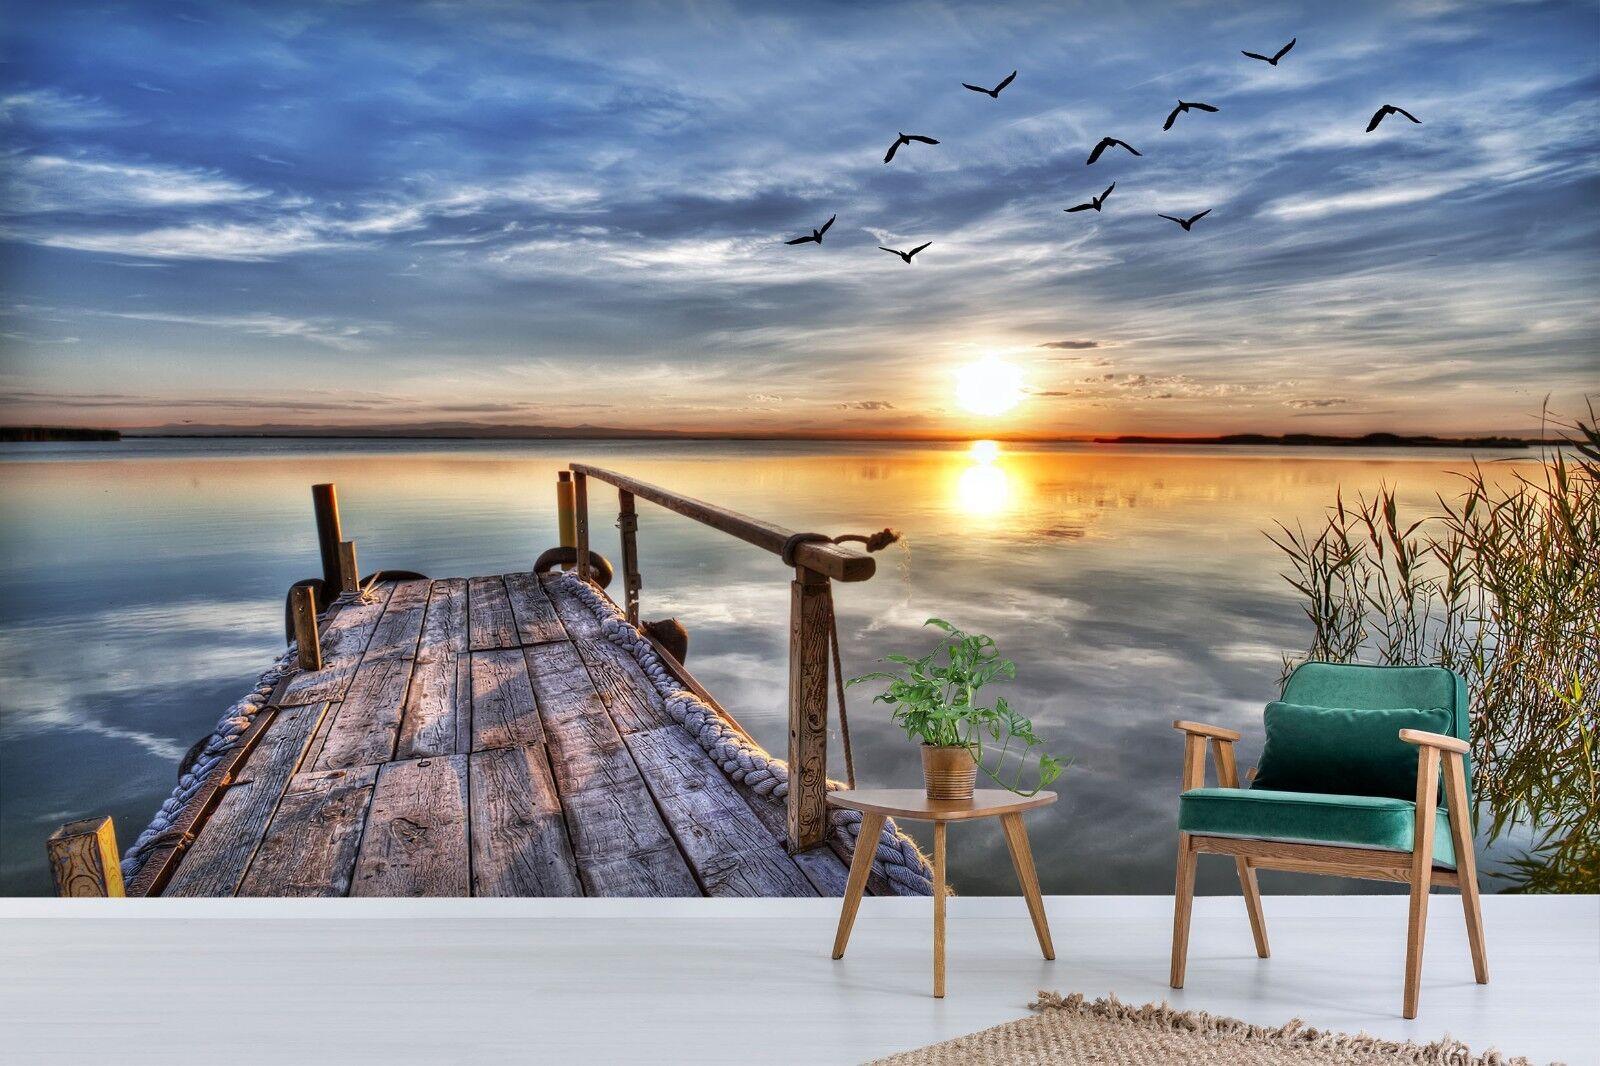 3D Seen Vögel 7115 Tapete Wandgemälde Tapete Tapeten Bild Familie DE Sidney | Heißer Verkauf  | Shop  | Primäre Qualität